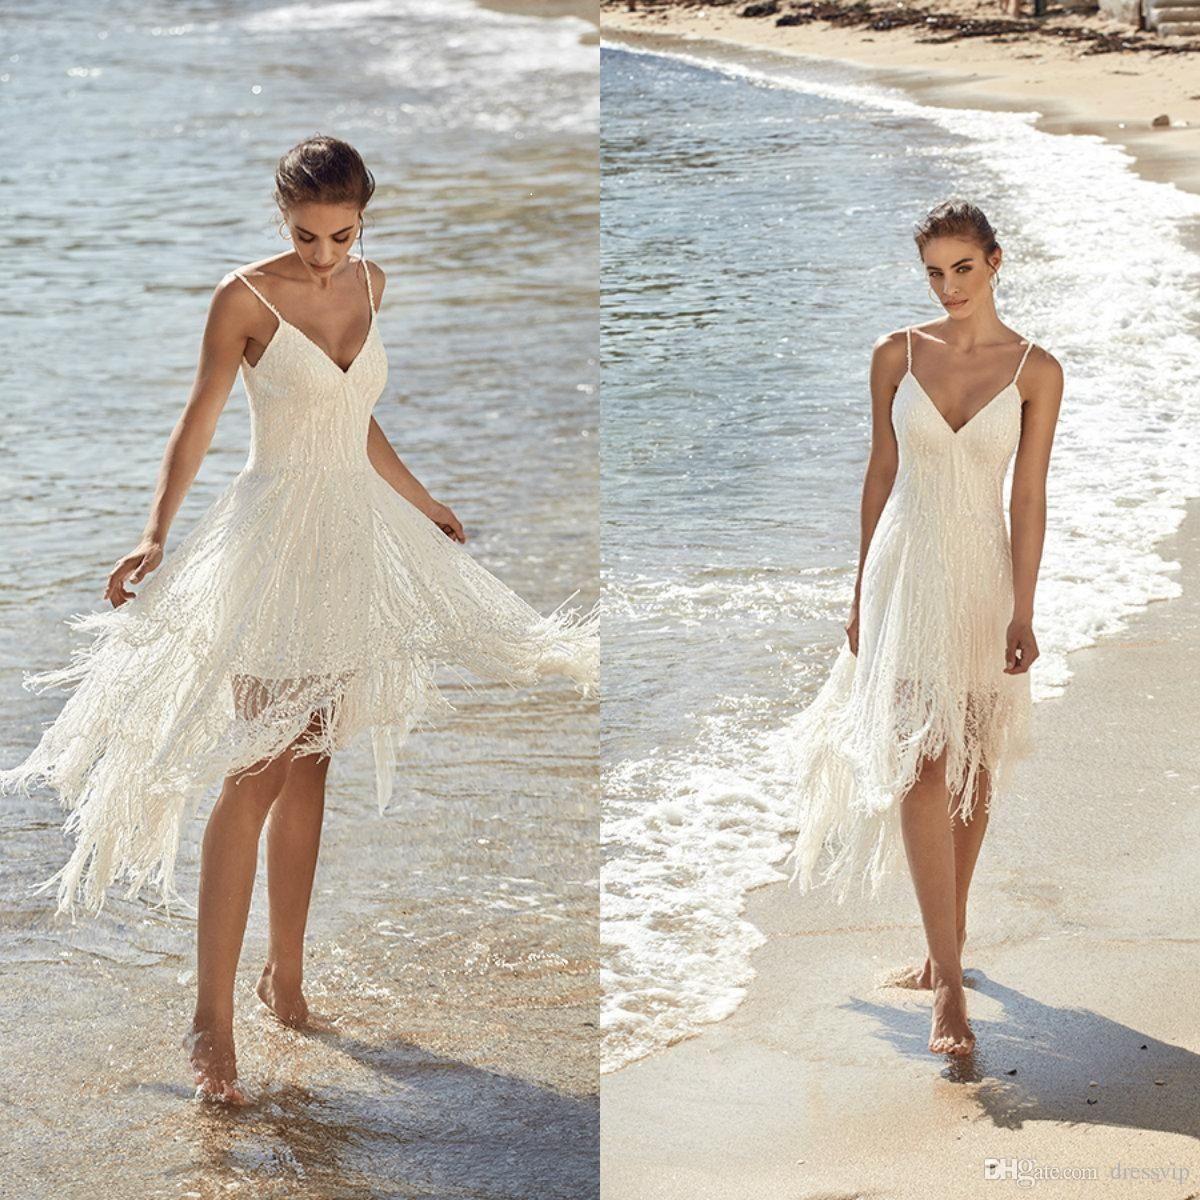 Simple Neckline Beach Wedding Dress In 2020 Simple Wedding Dress Beach Short Wedding Dress Beach Wedding Gown Inspiration